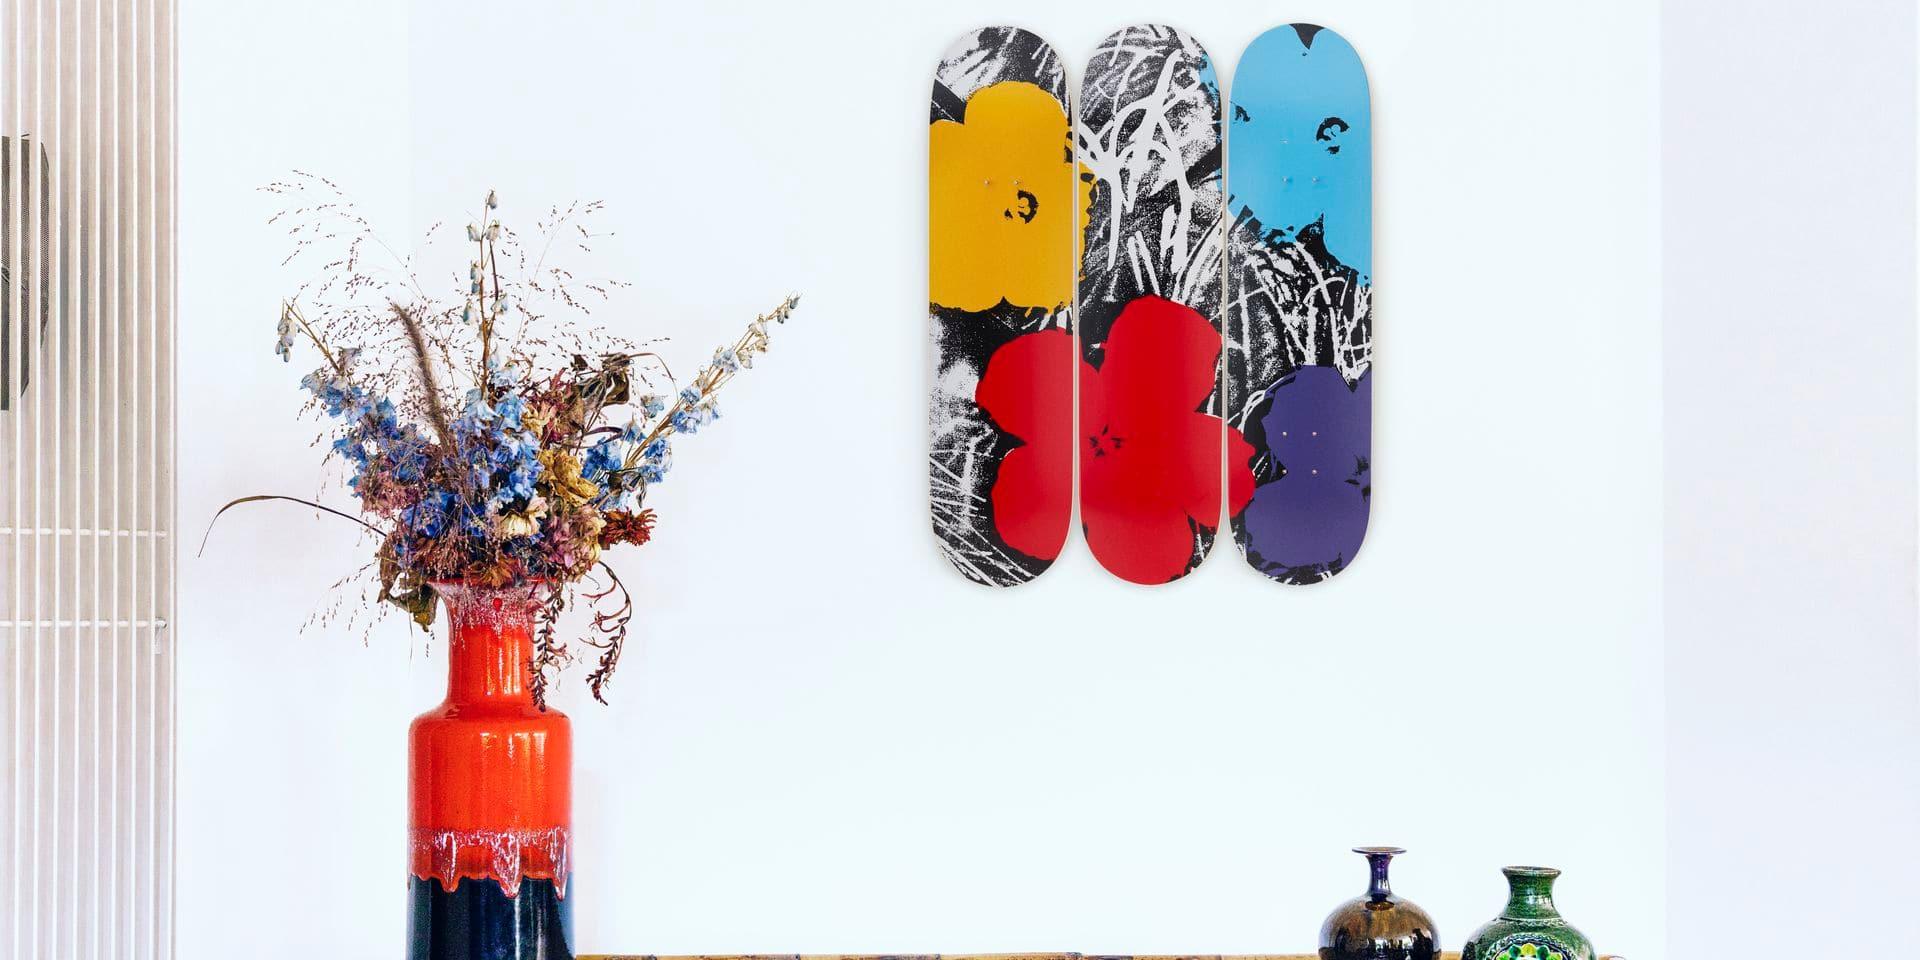 The Skateroom, quand le skate s'impose dans la capitale